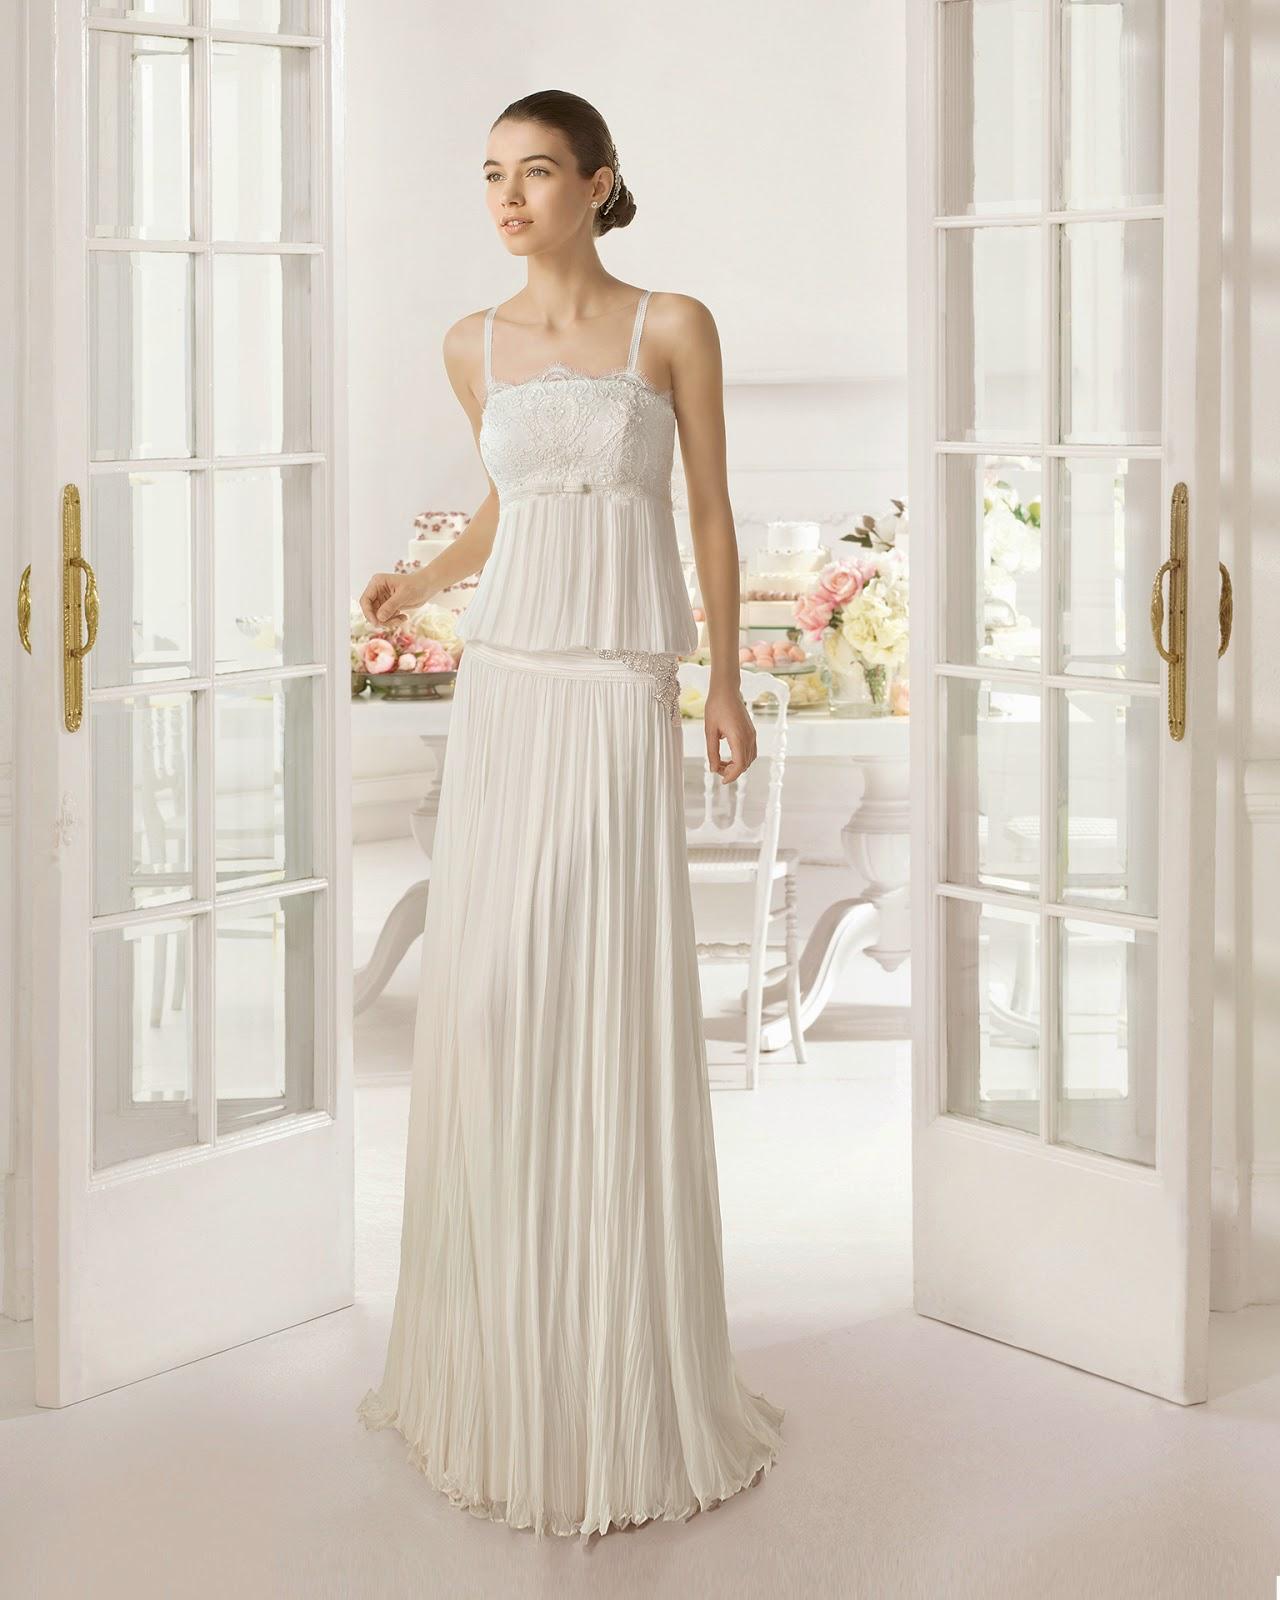 guia tipos de telas de vestidos de novia - blog mi boda - tela bambula